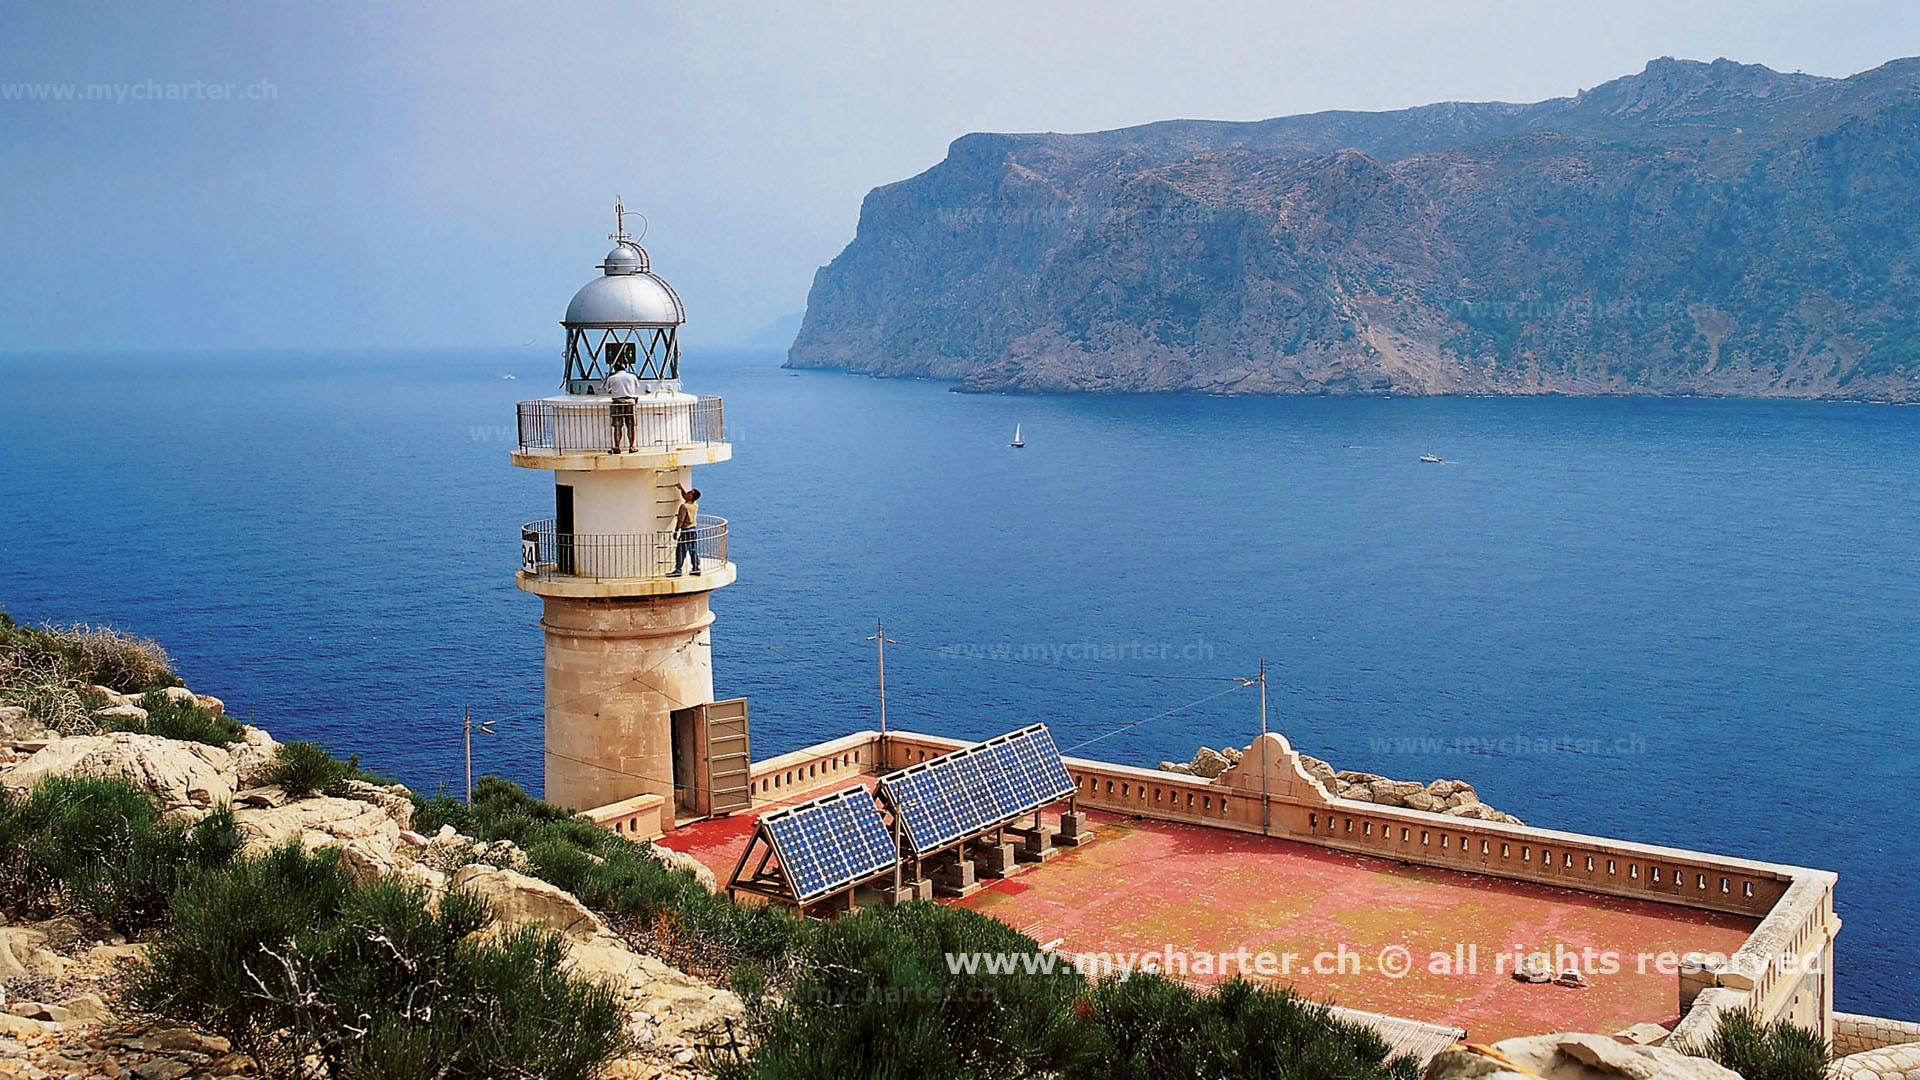 Mallorca - Faro de Tramuntana